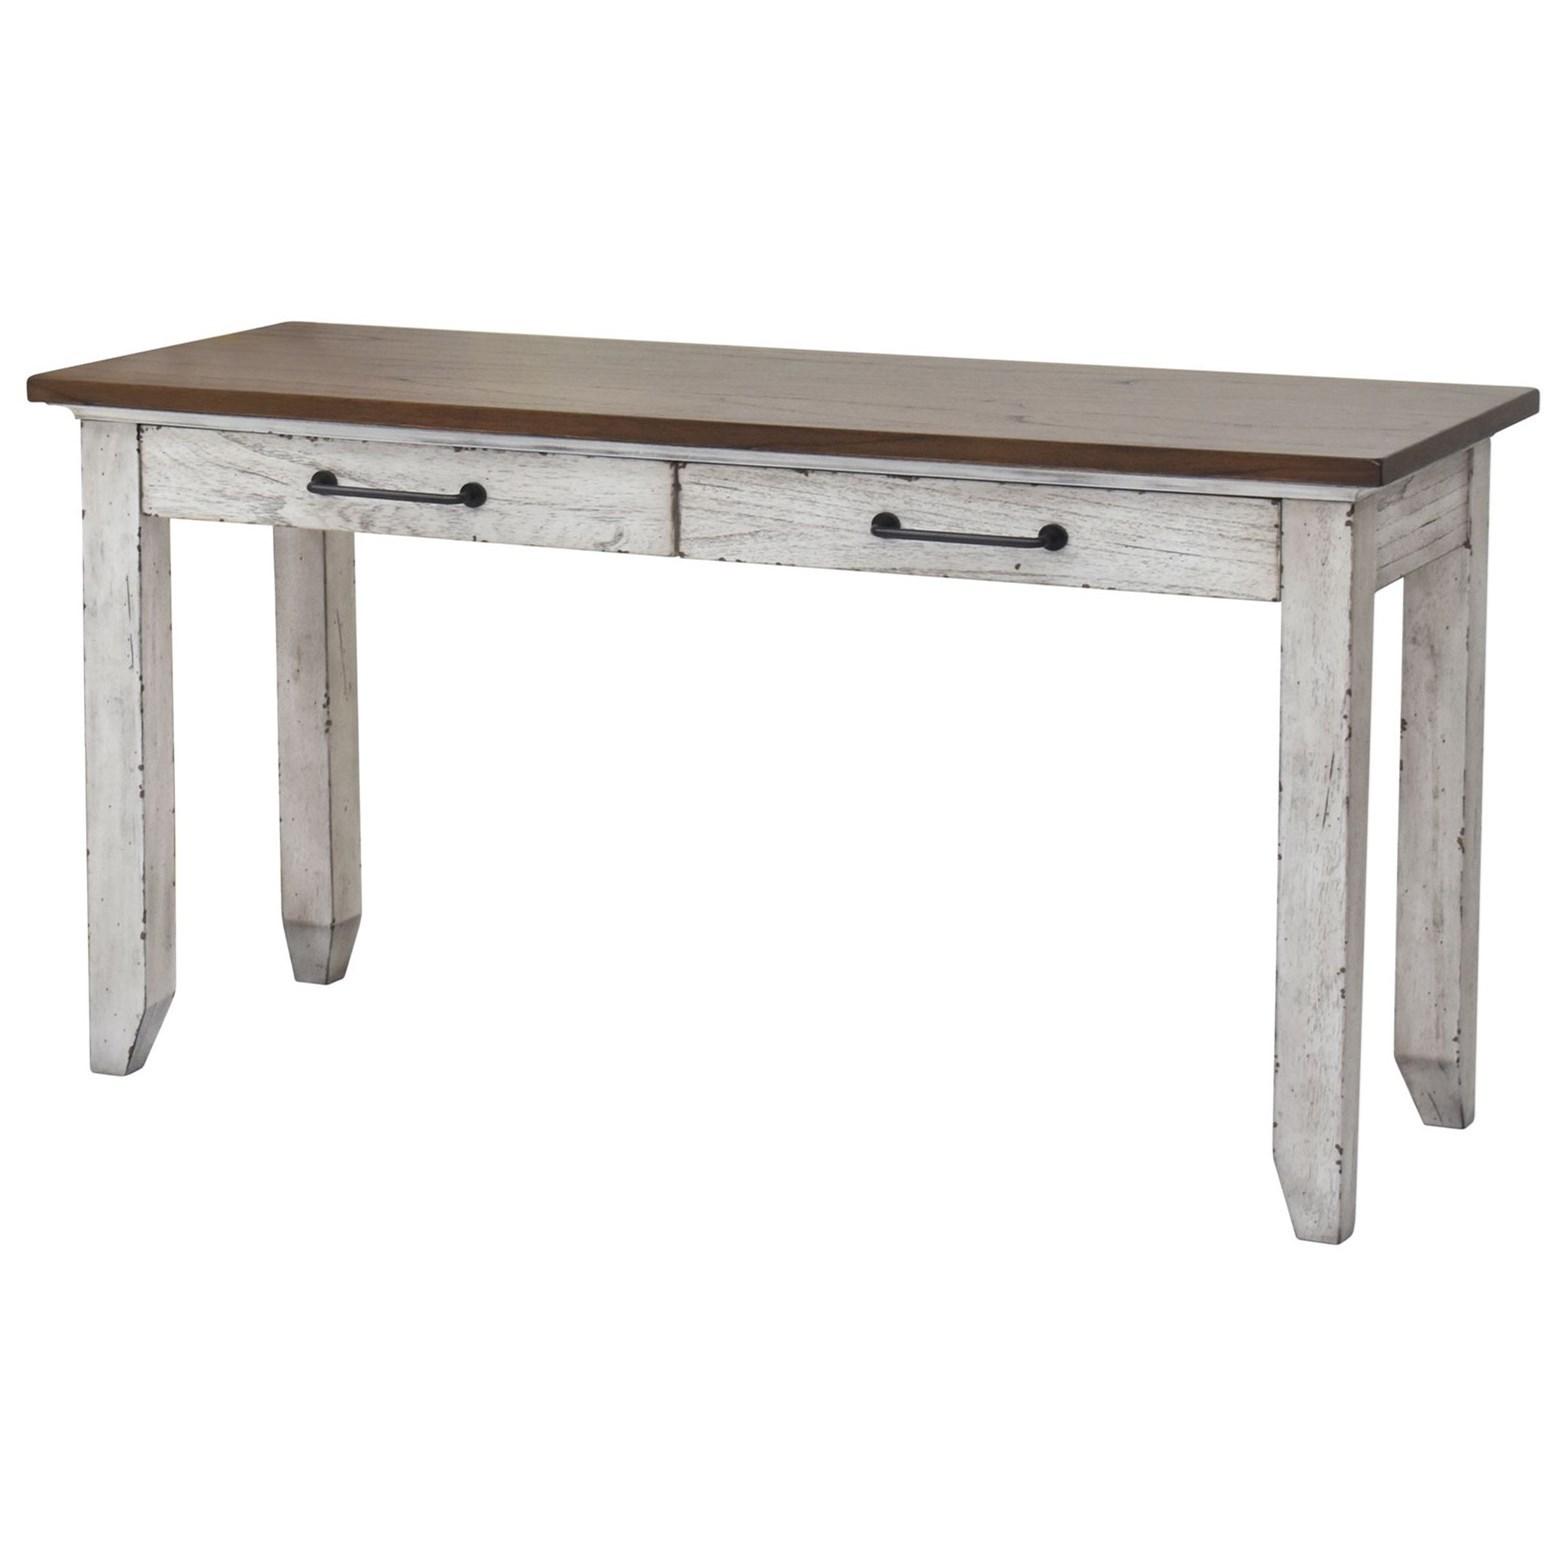 Bear Creek Sofa Table by Steve Silver at Walker's Furniture